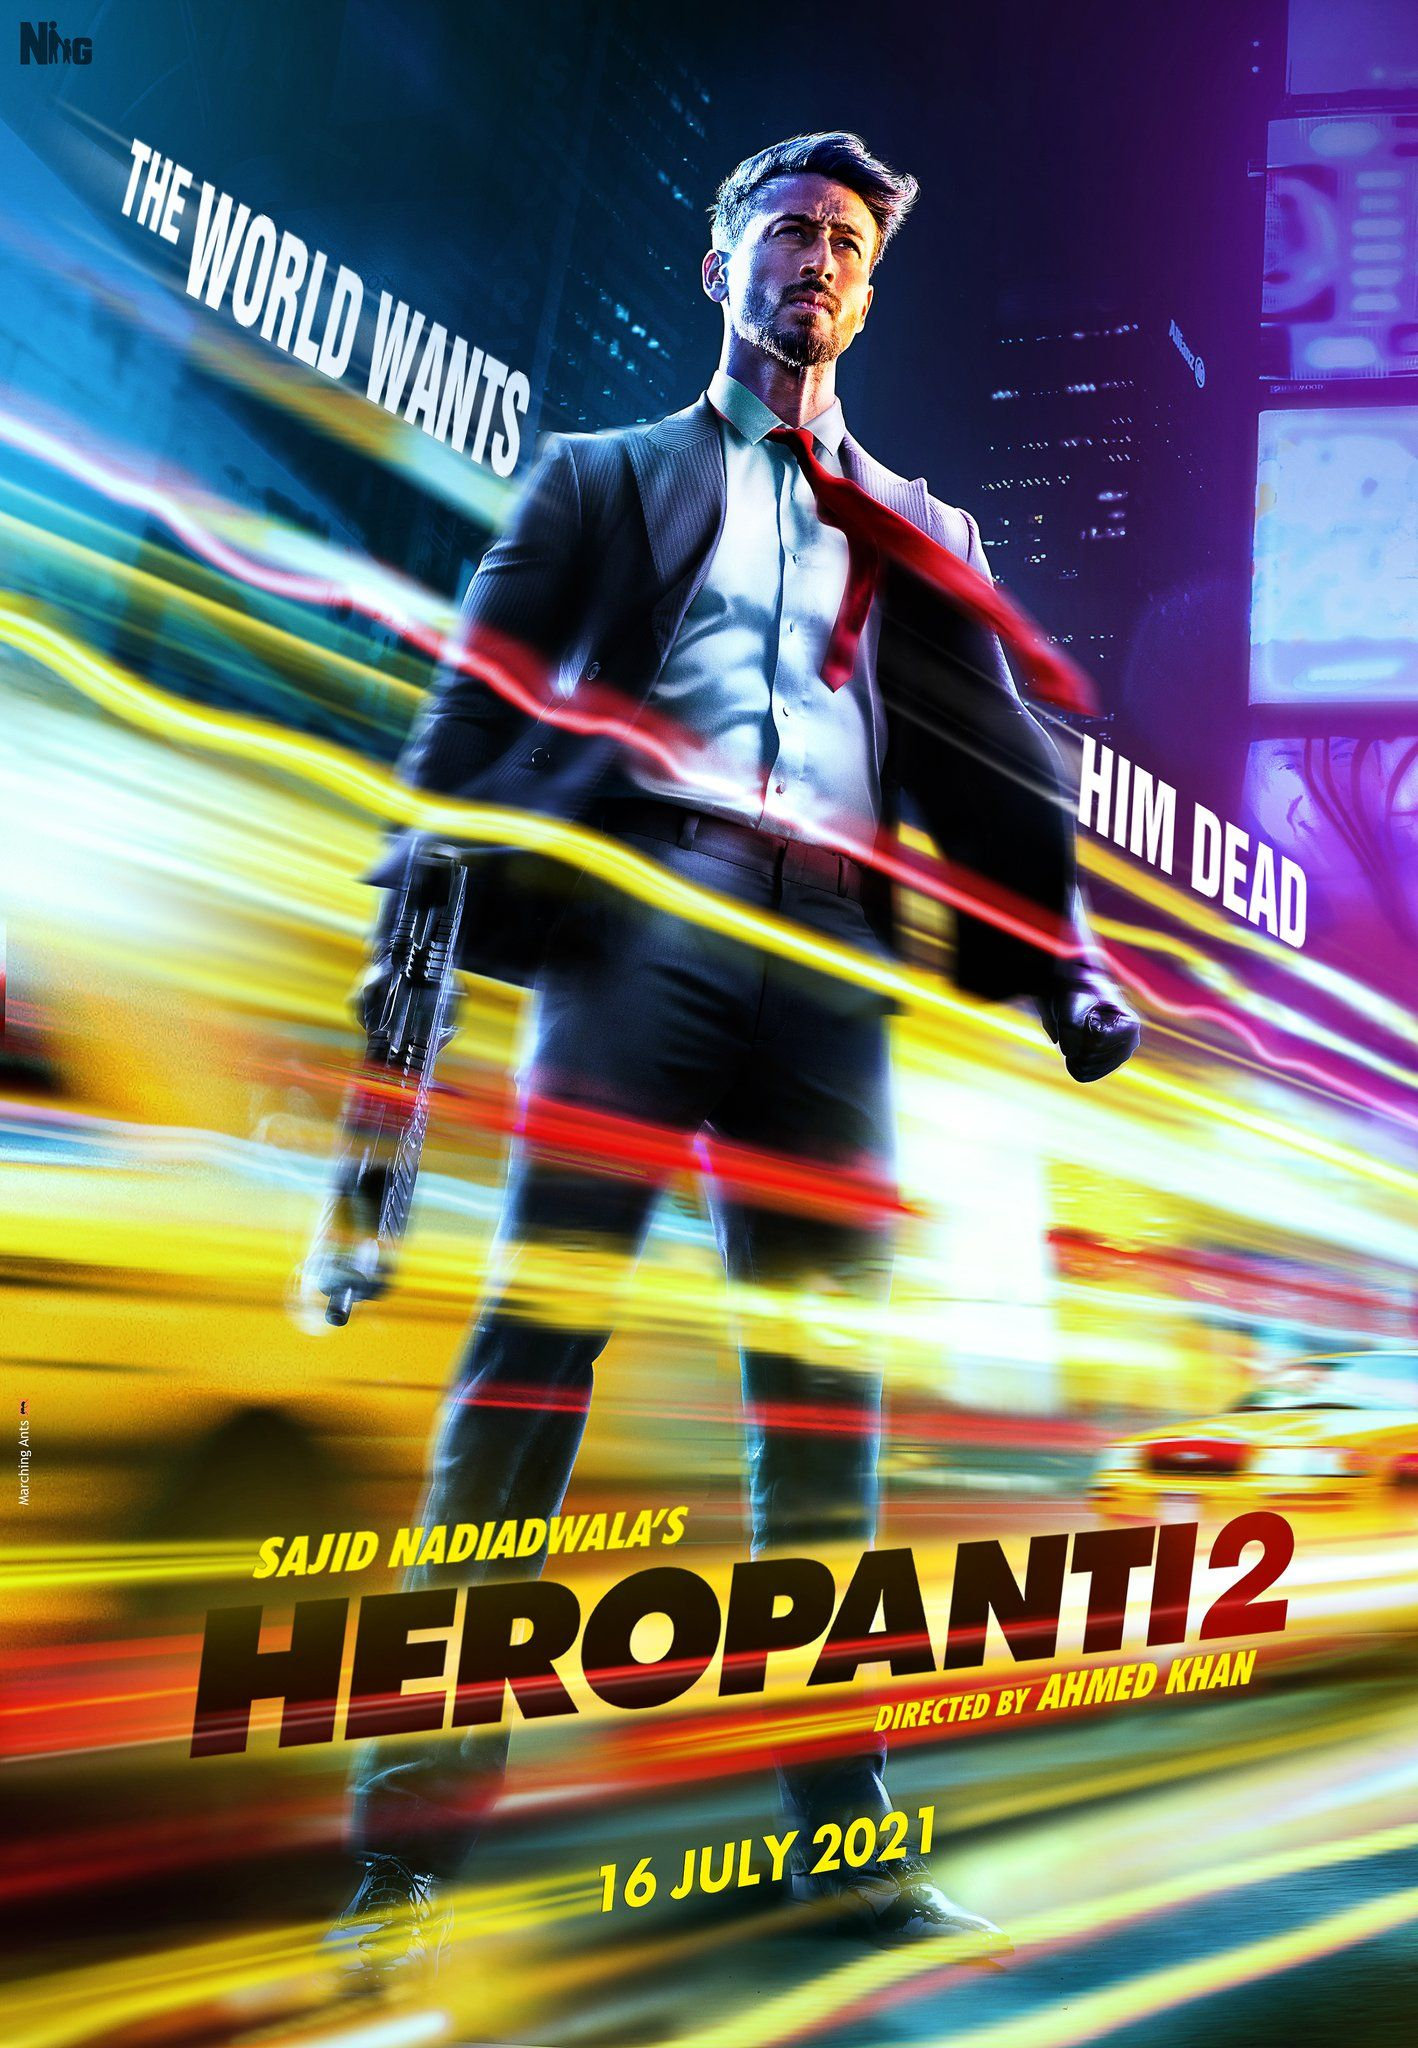 Heropanti 2 (2021Movie) Bollywood Hindi Film